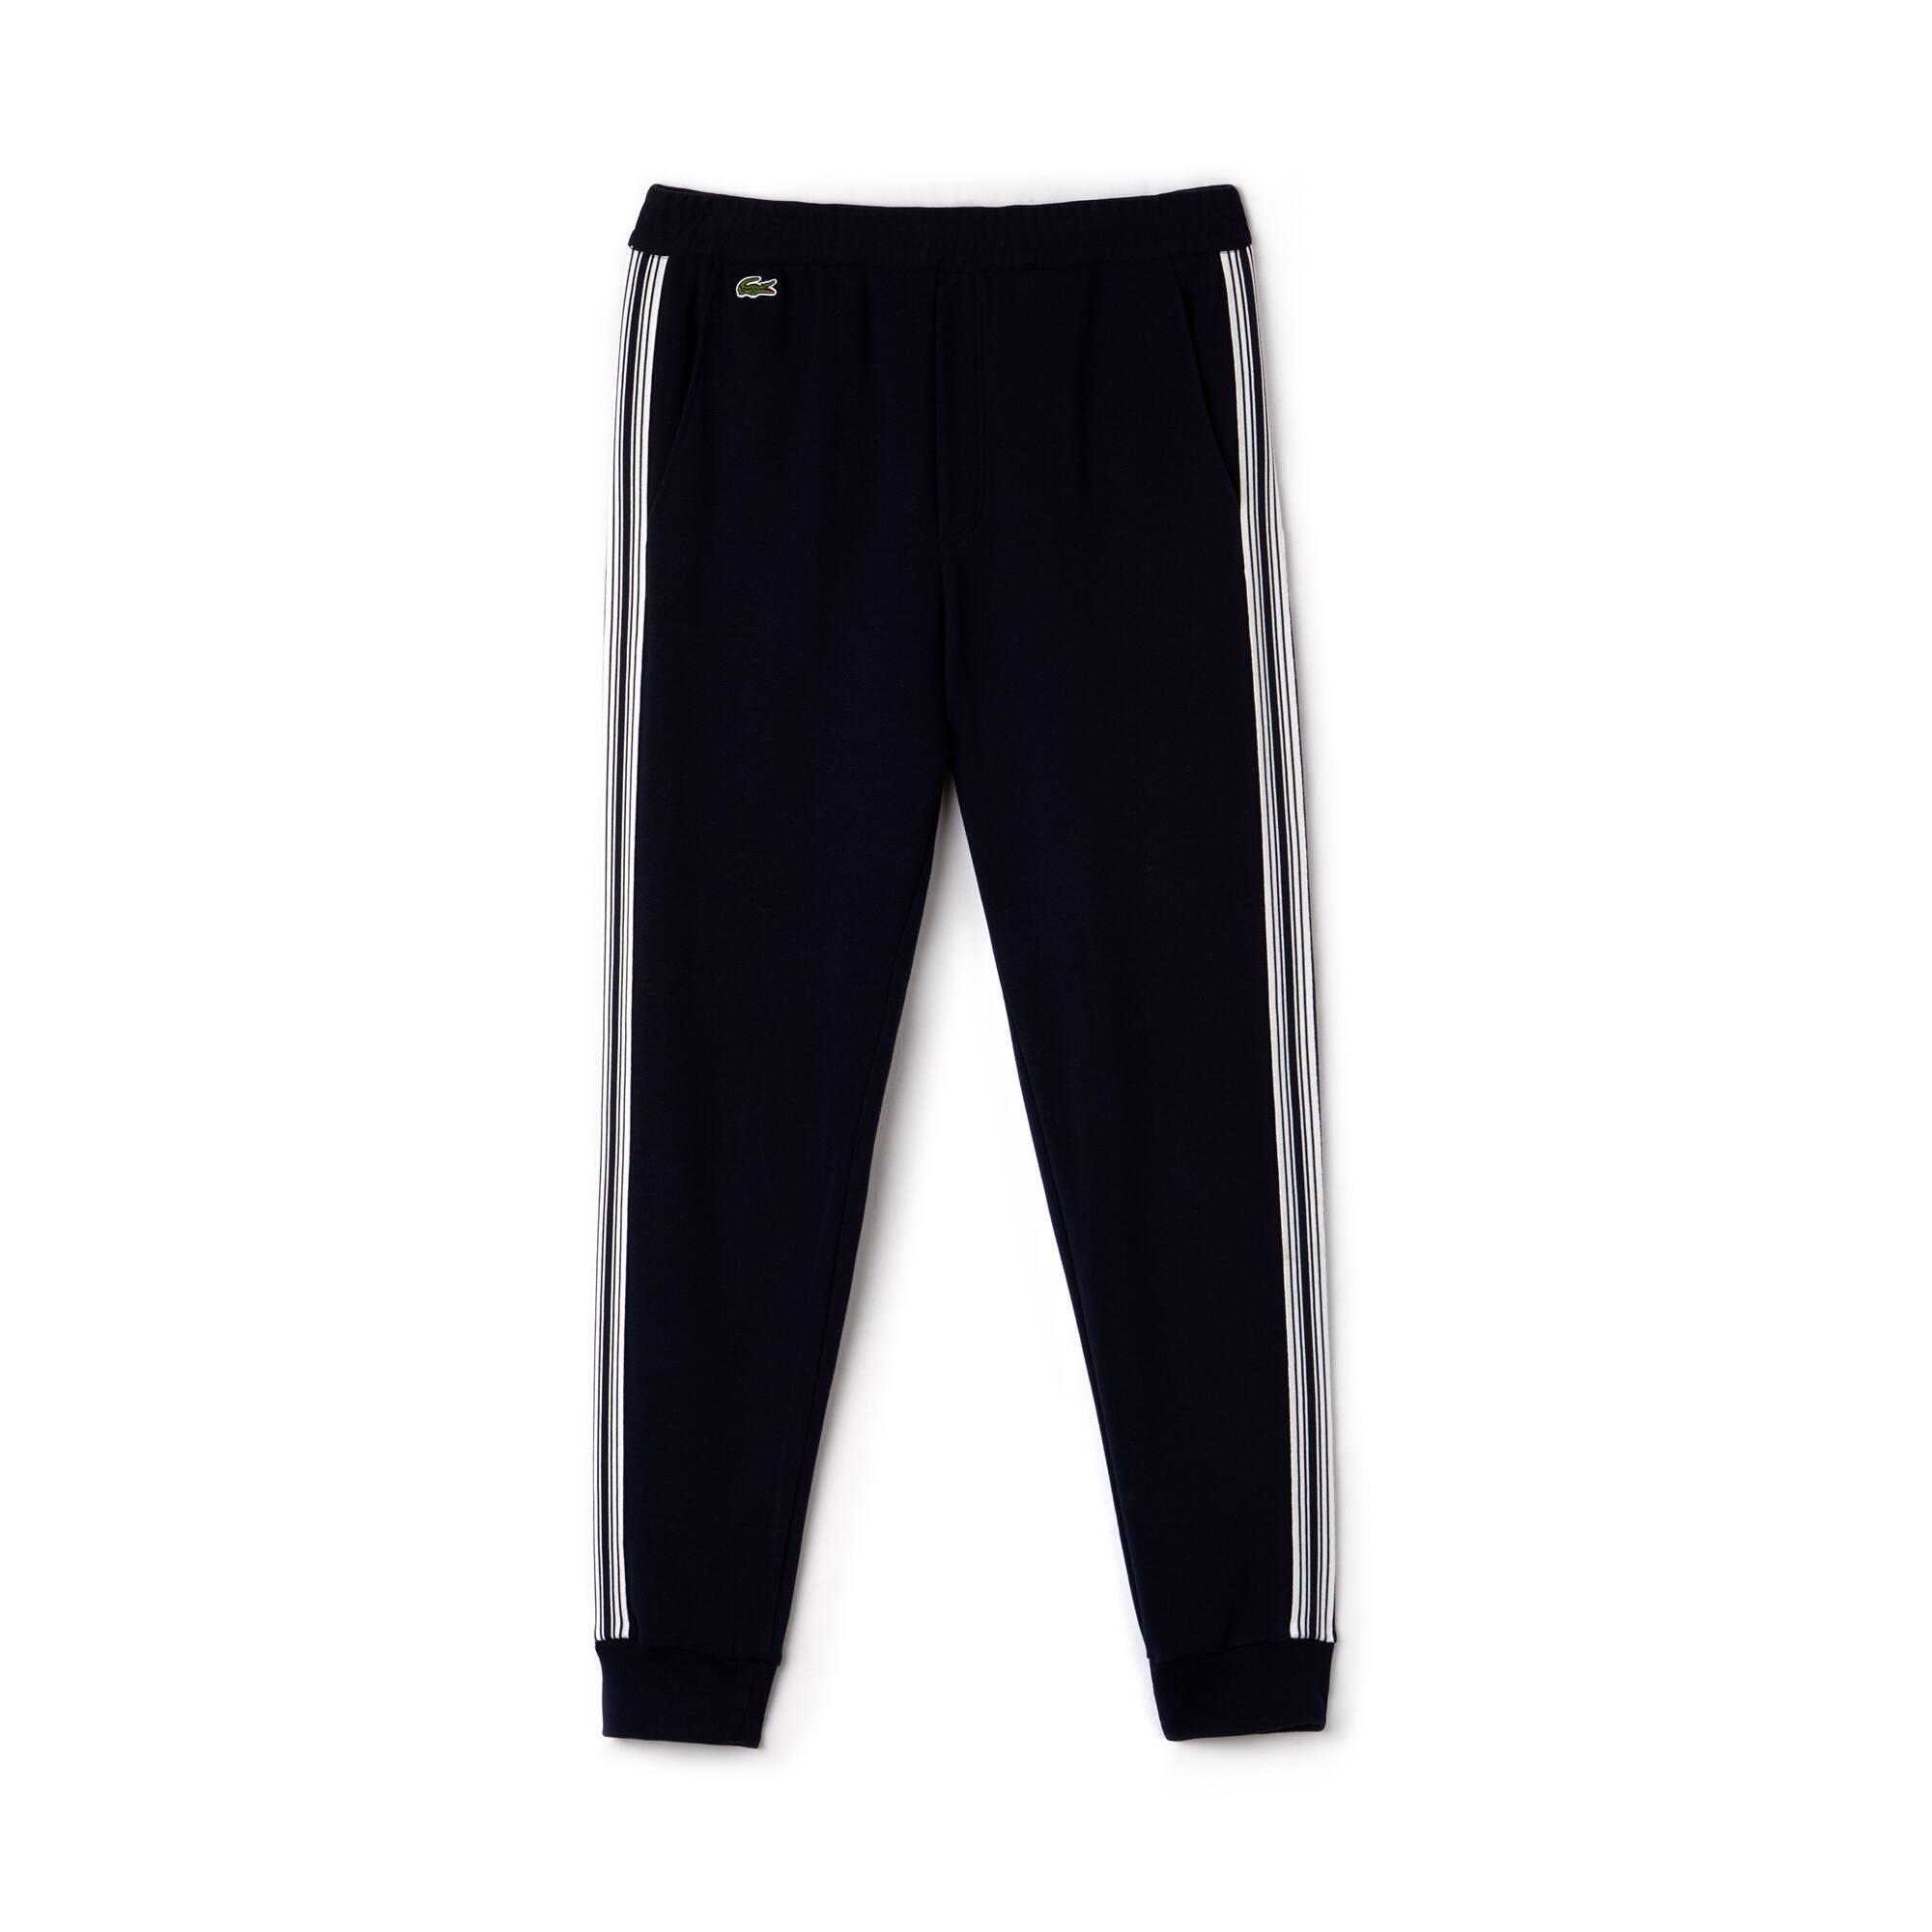 Jogging urbain en coton milano avec bandes contrastées